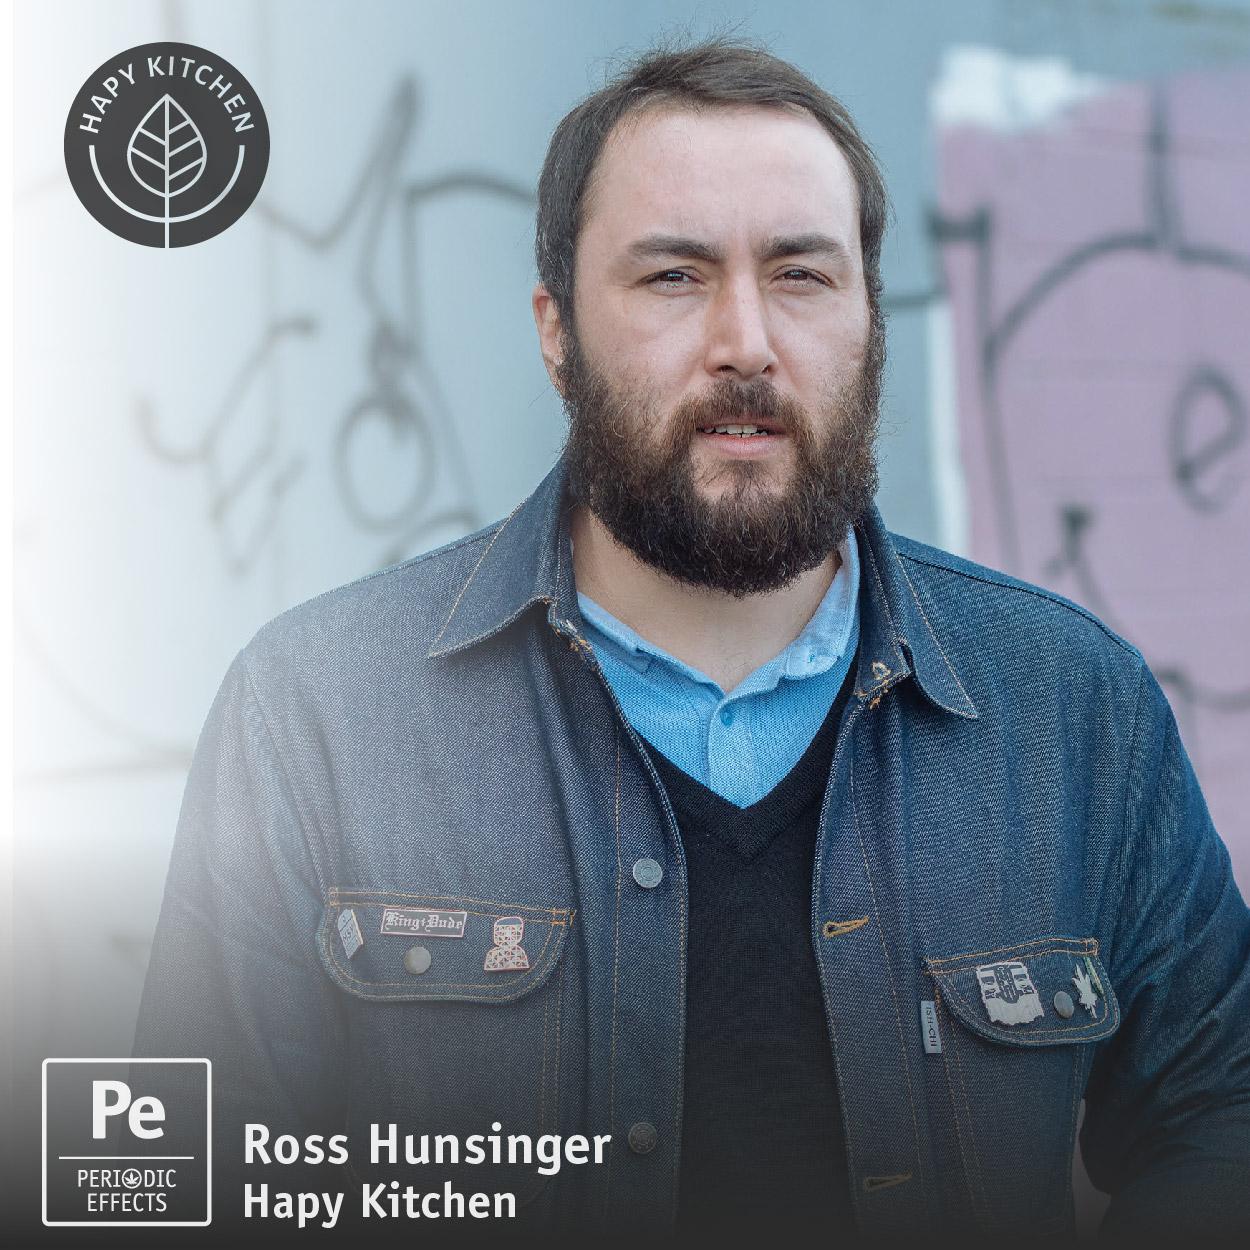 Ross Hunsinger from Hapy Kitchen, Cannabis Edible maker, paleo bar